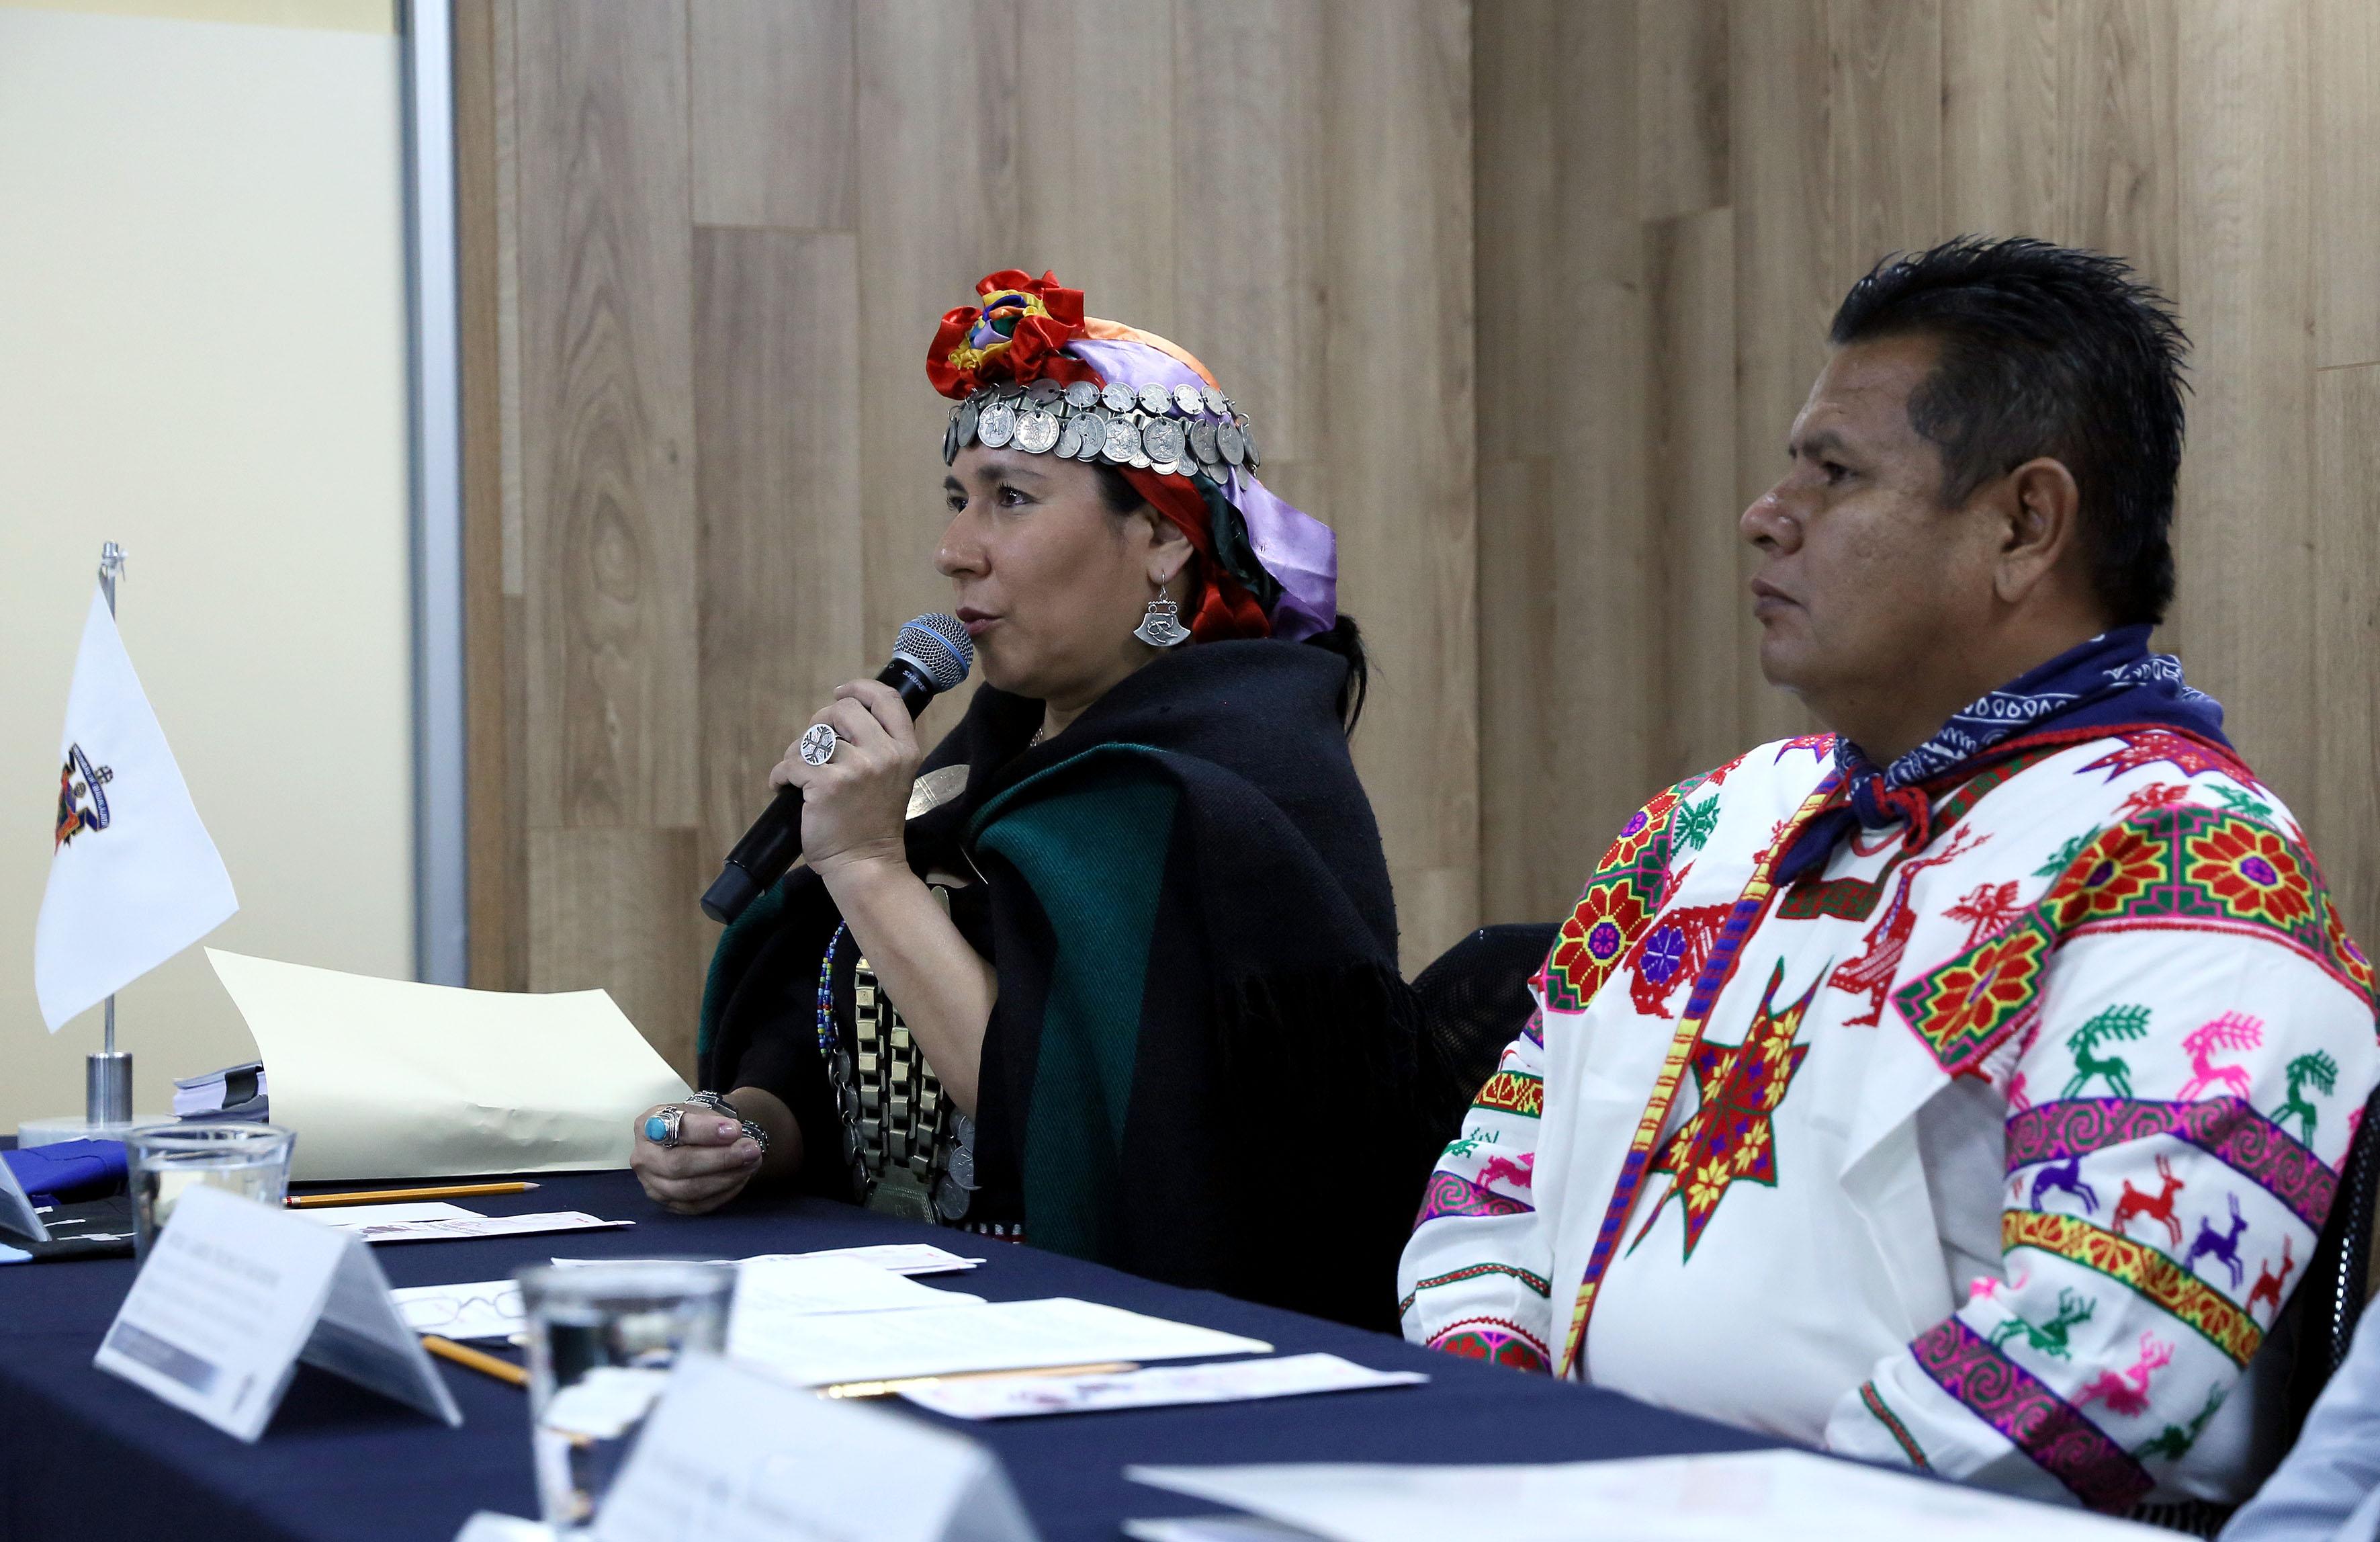 Maestra Libertad Manque, Poetisa chilena de origen mapuche, frente al micrófono